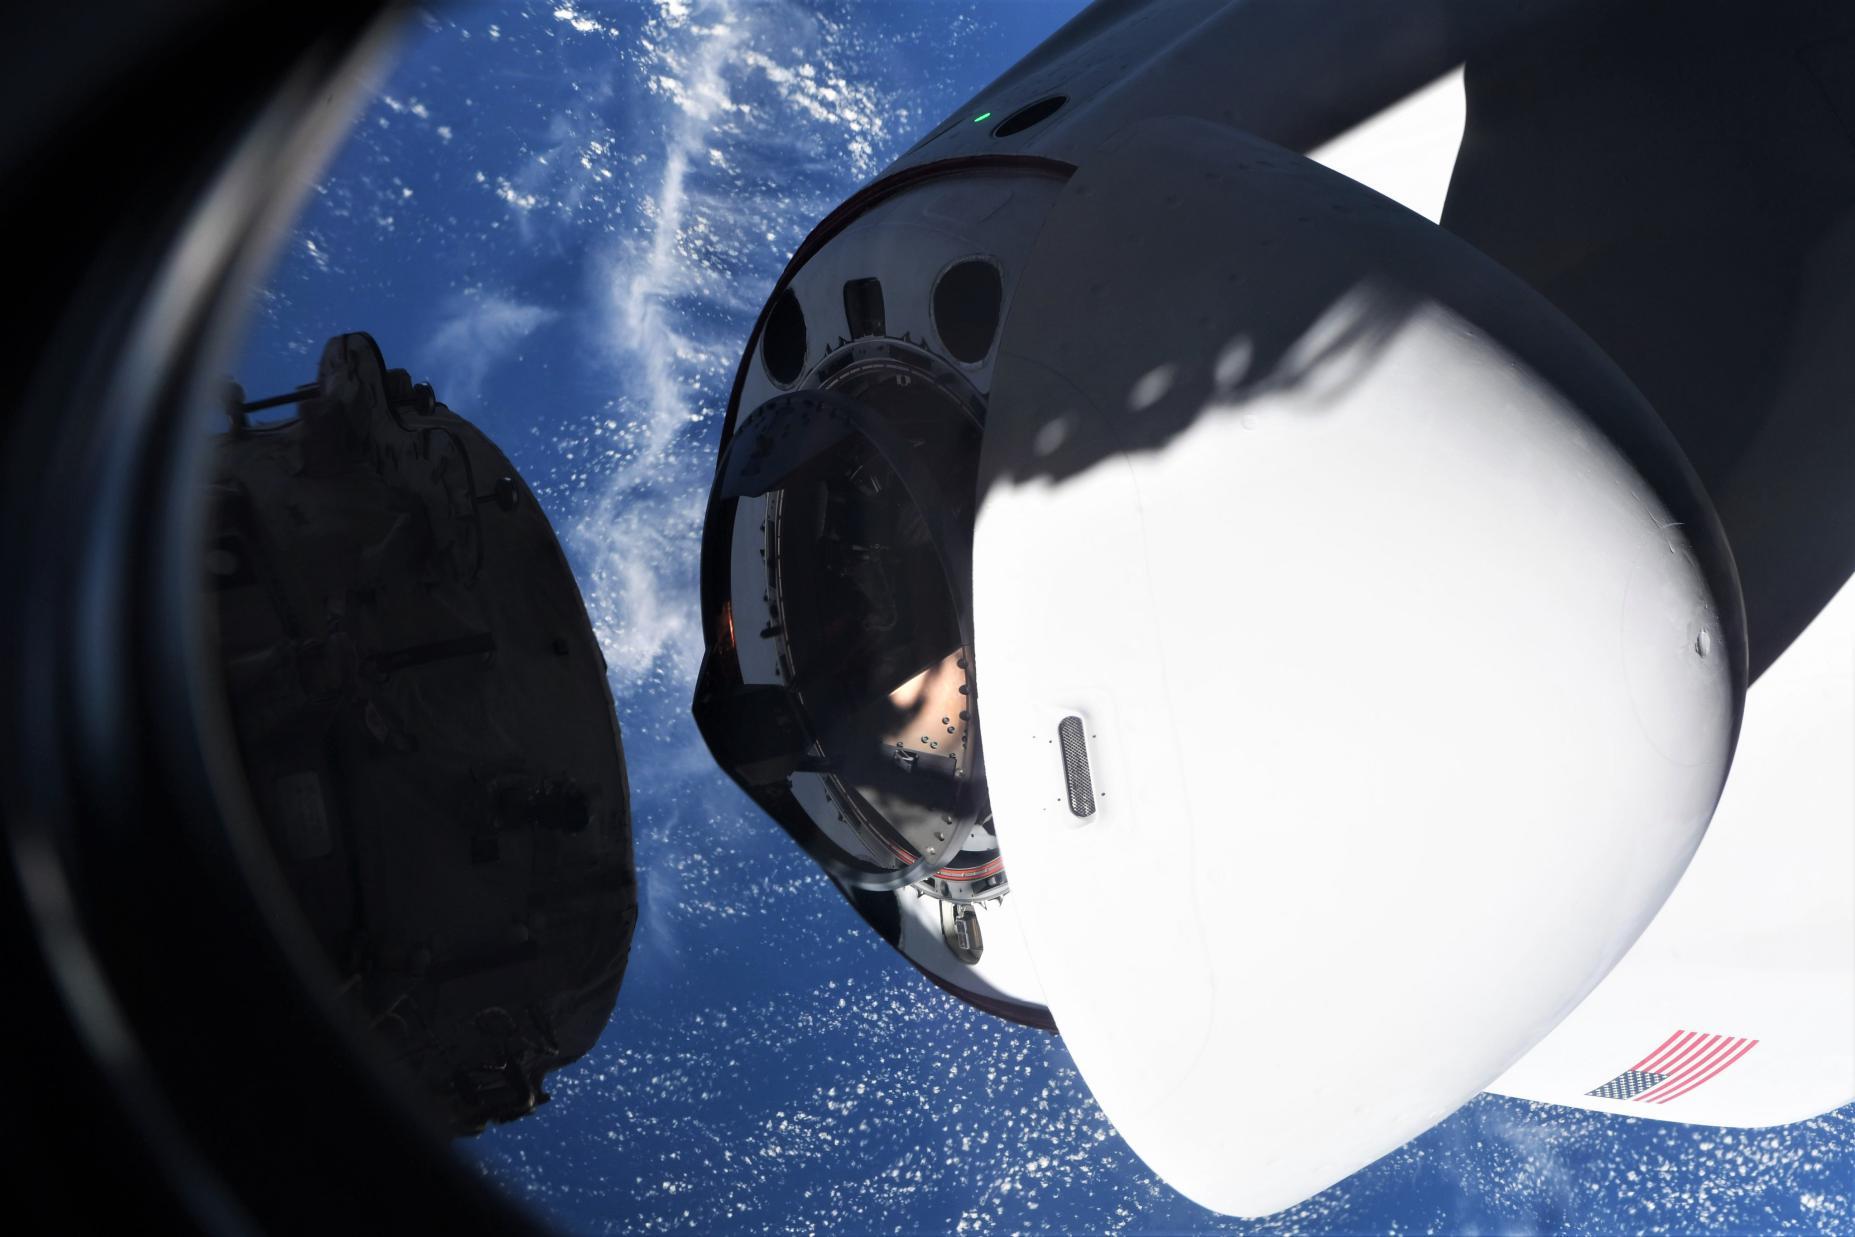 Crew-2 Crew Dragon C206 ISS arrival 042421 (Mike Hopkins – NASA) C207 view 2 (c)